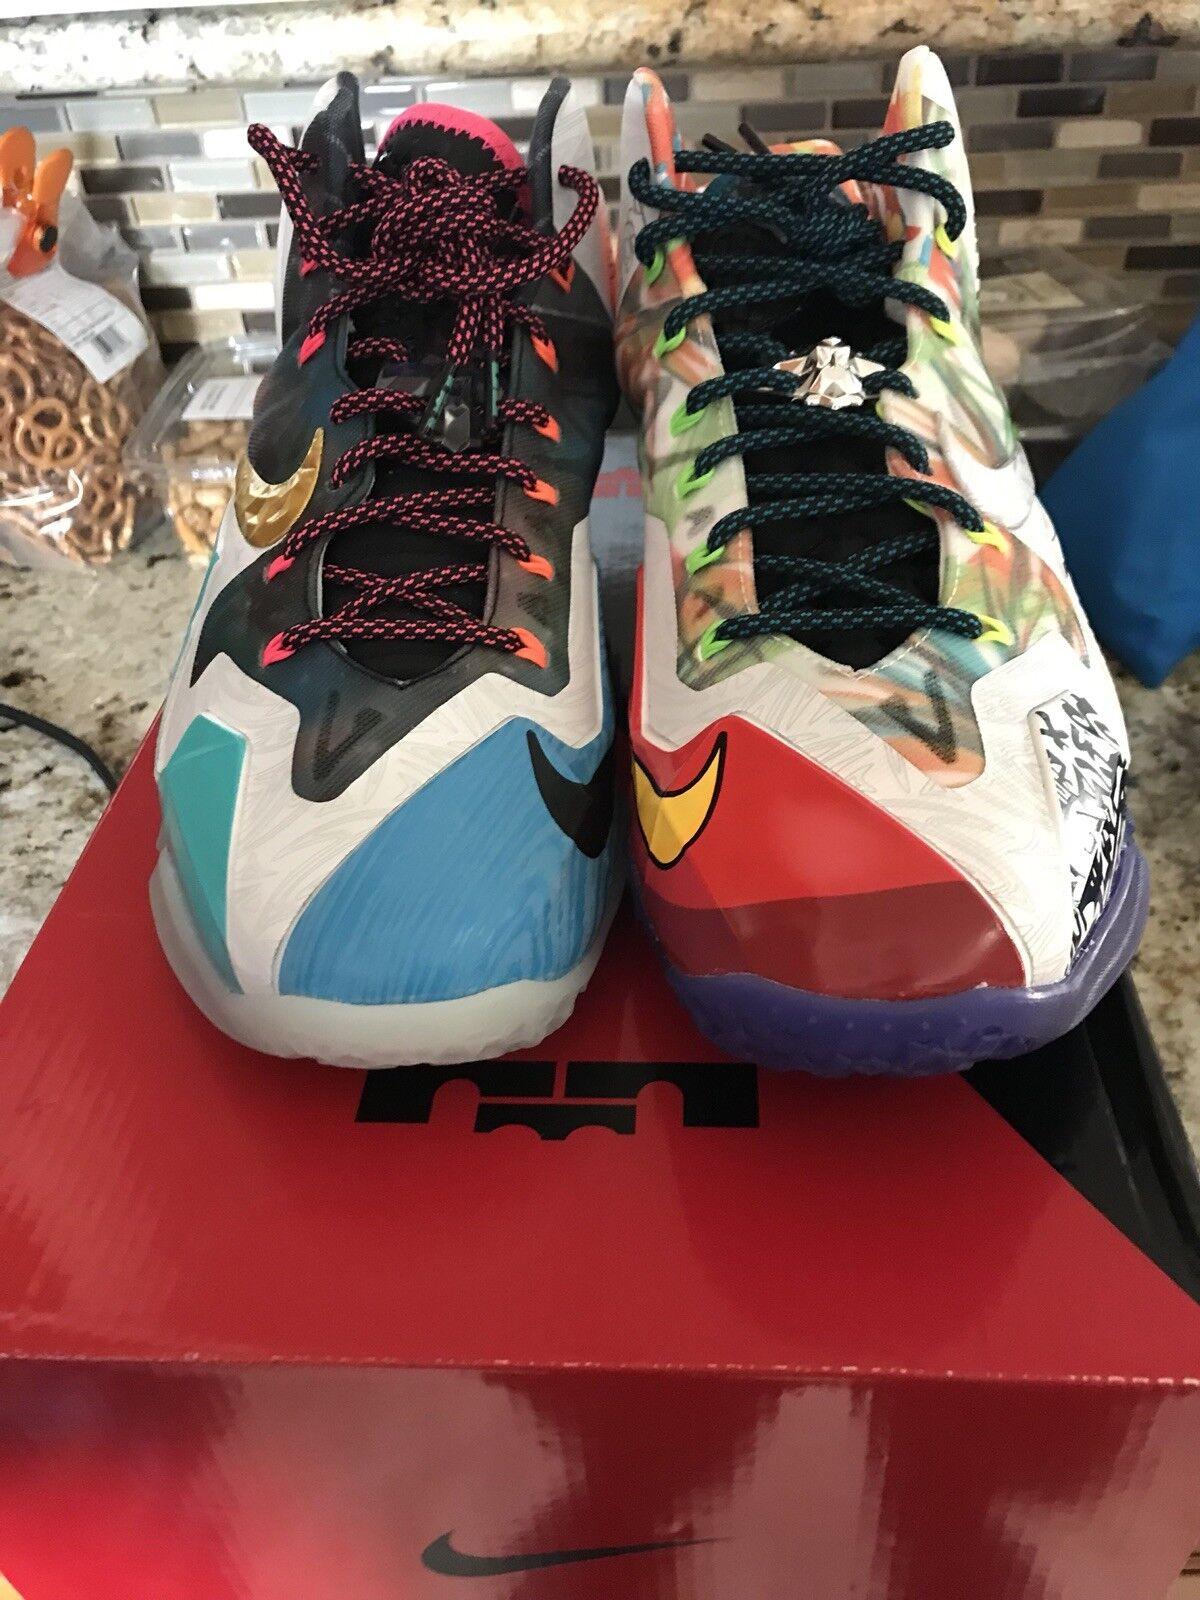 Nike Lebron XI 11 Premium WTL   What The Lebron   QS 650884-400 Size 11 2014 DS